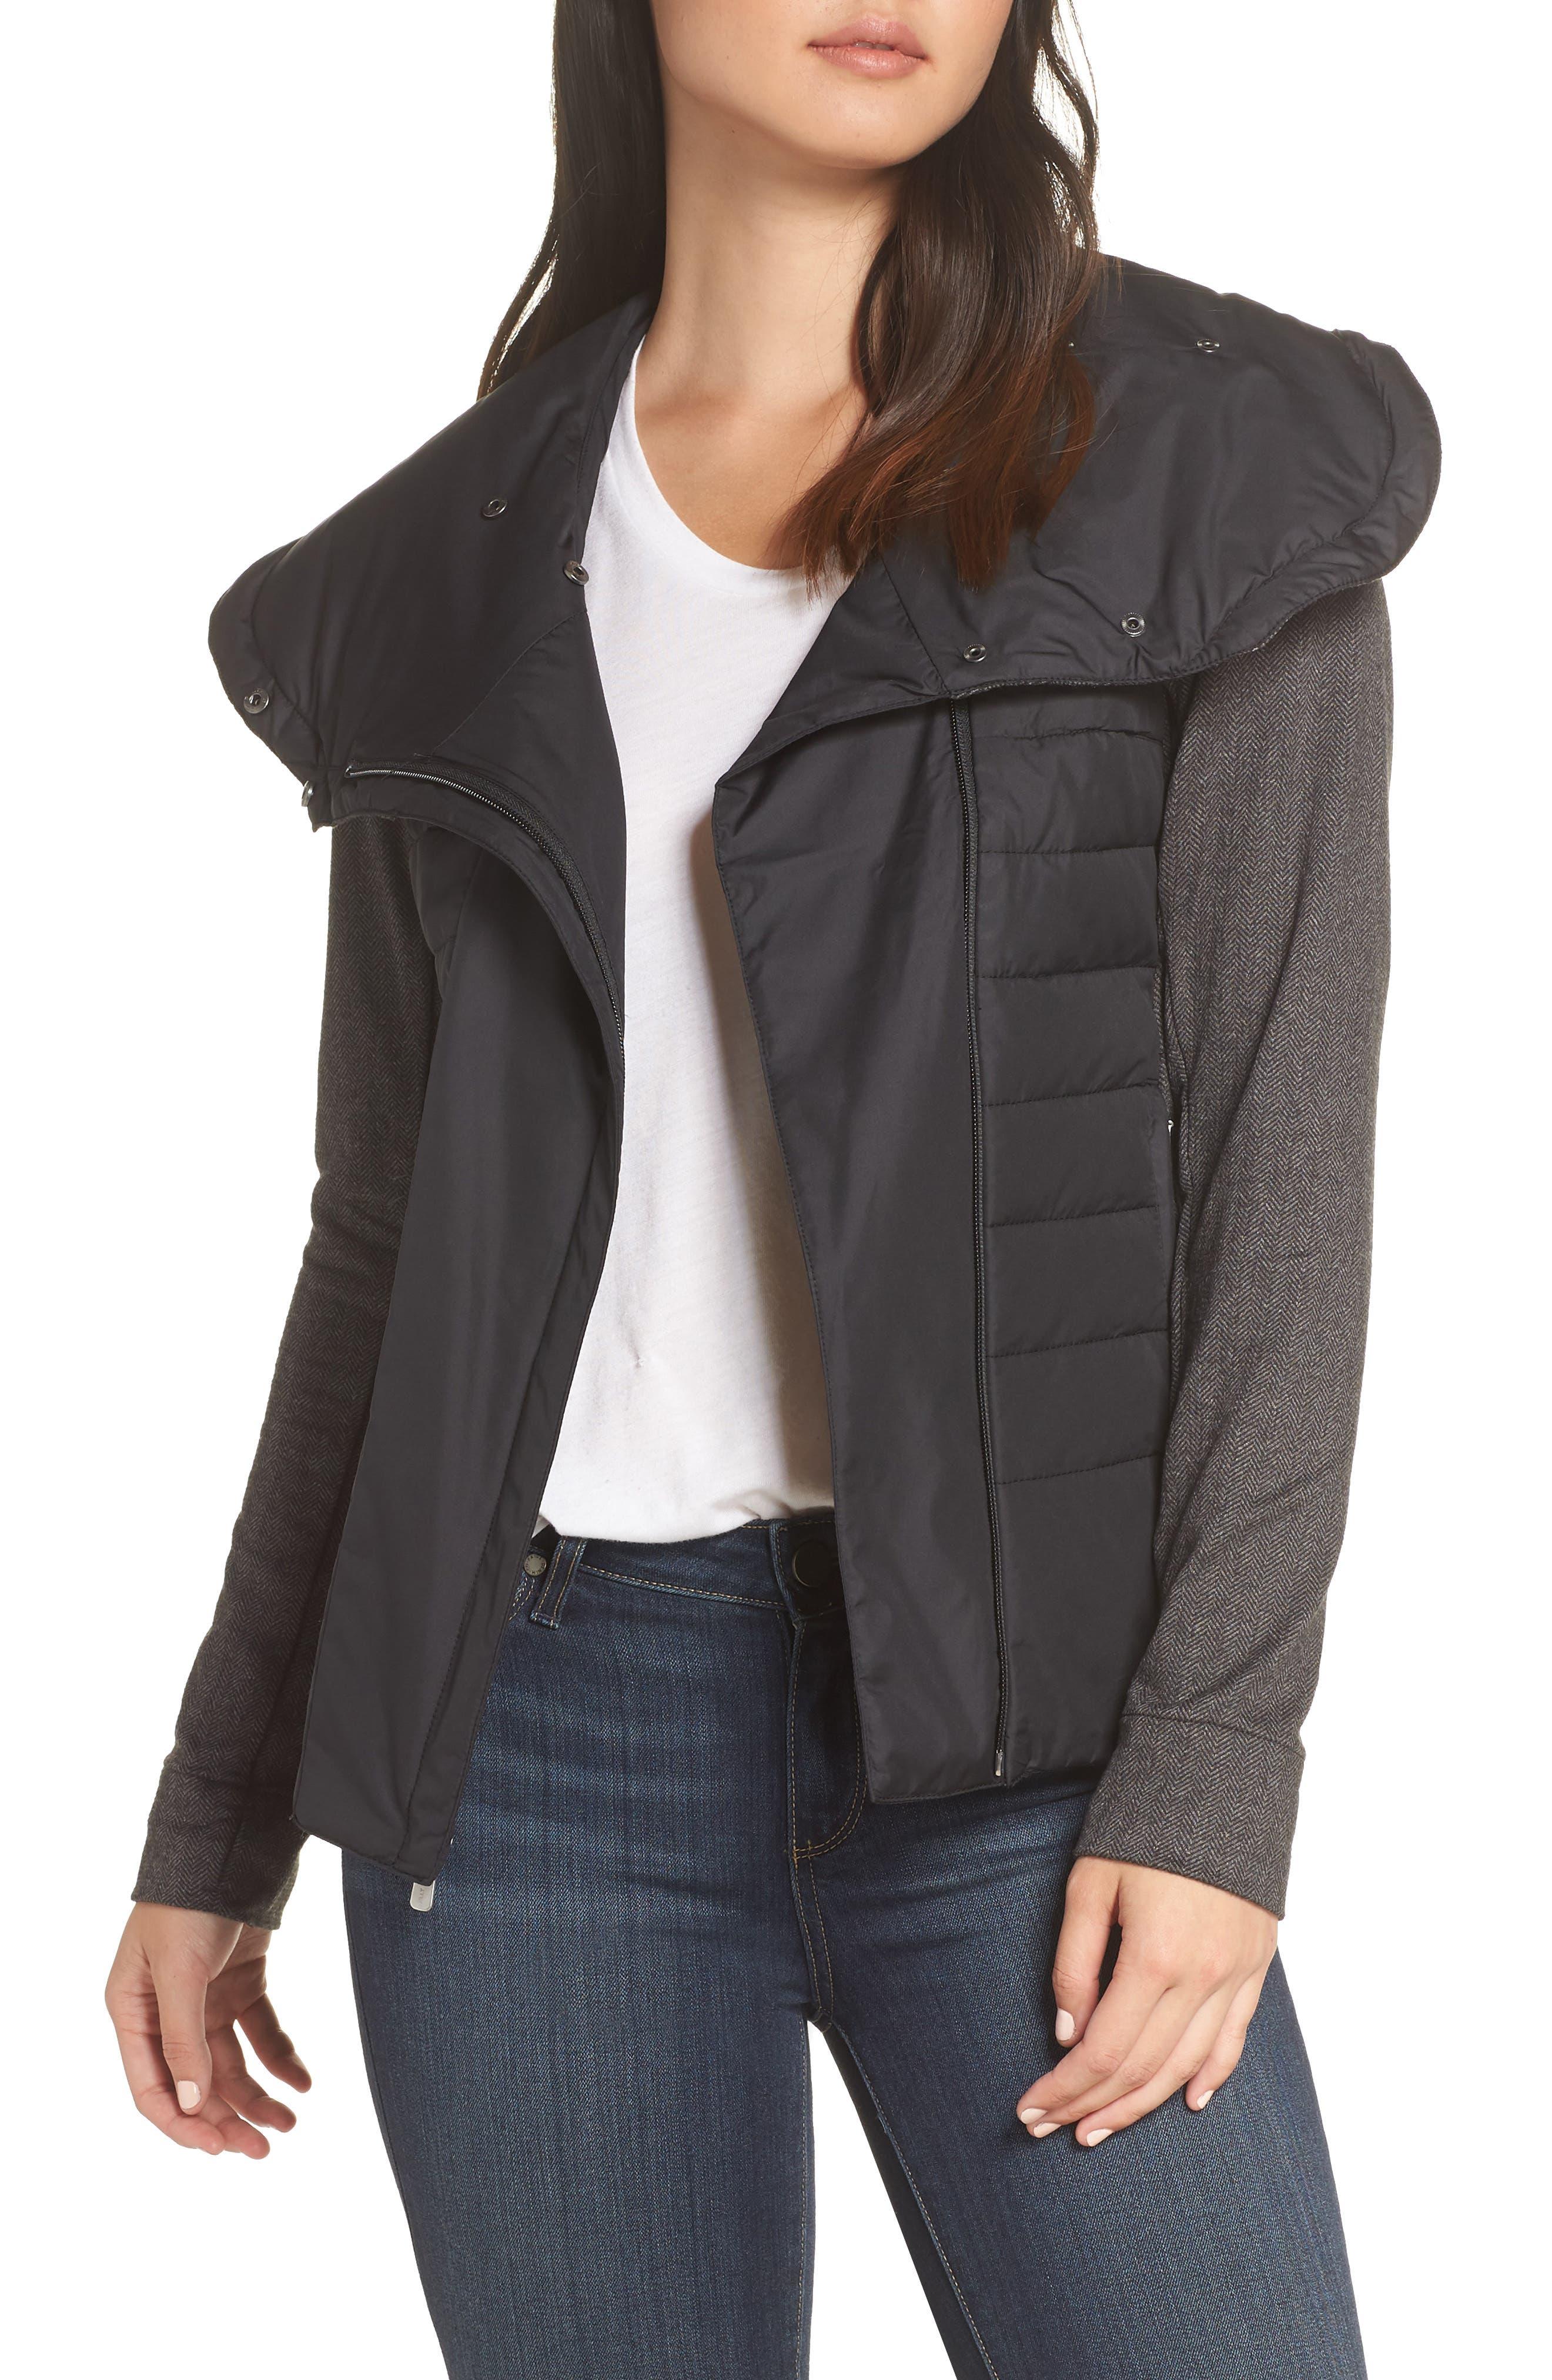 HellyHansen 'Astra' Jacket,                         Main,                         color, 001